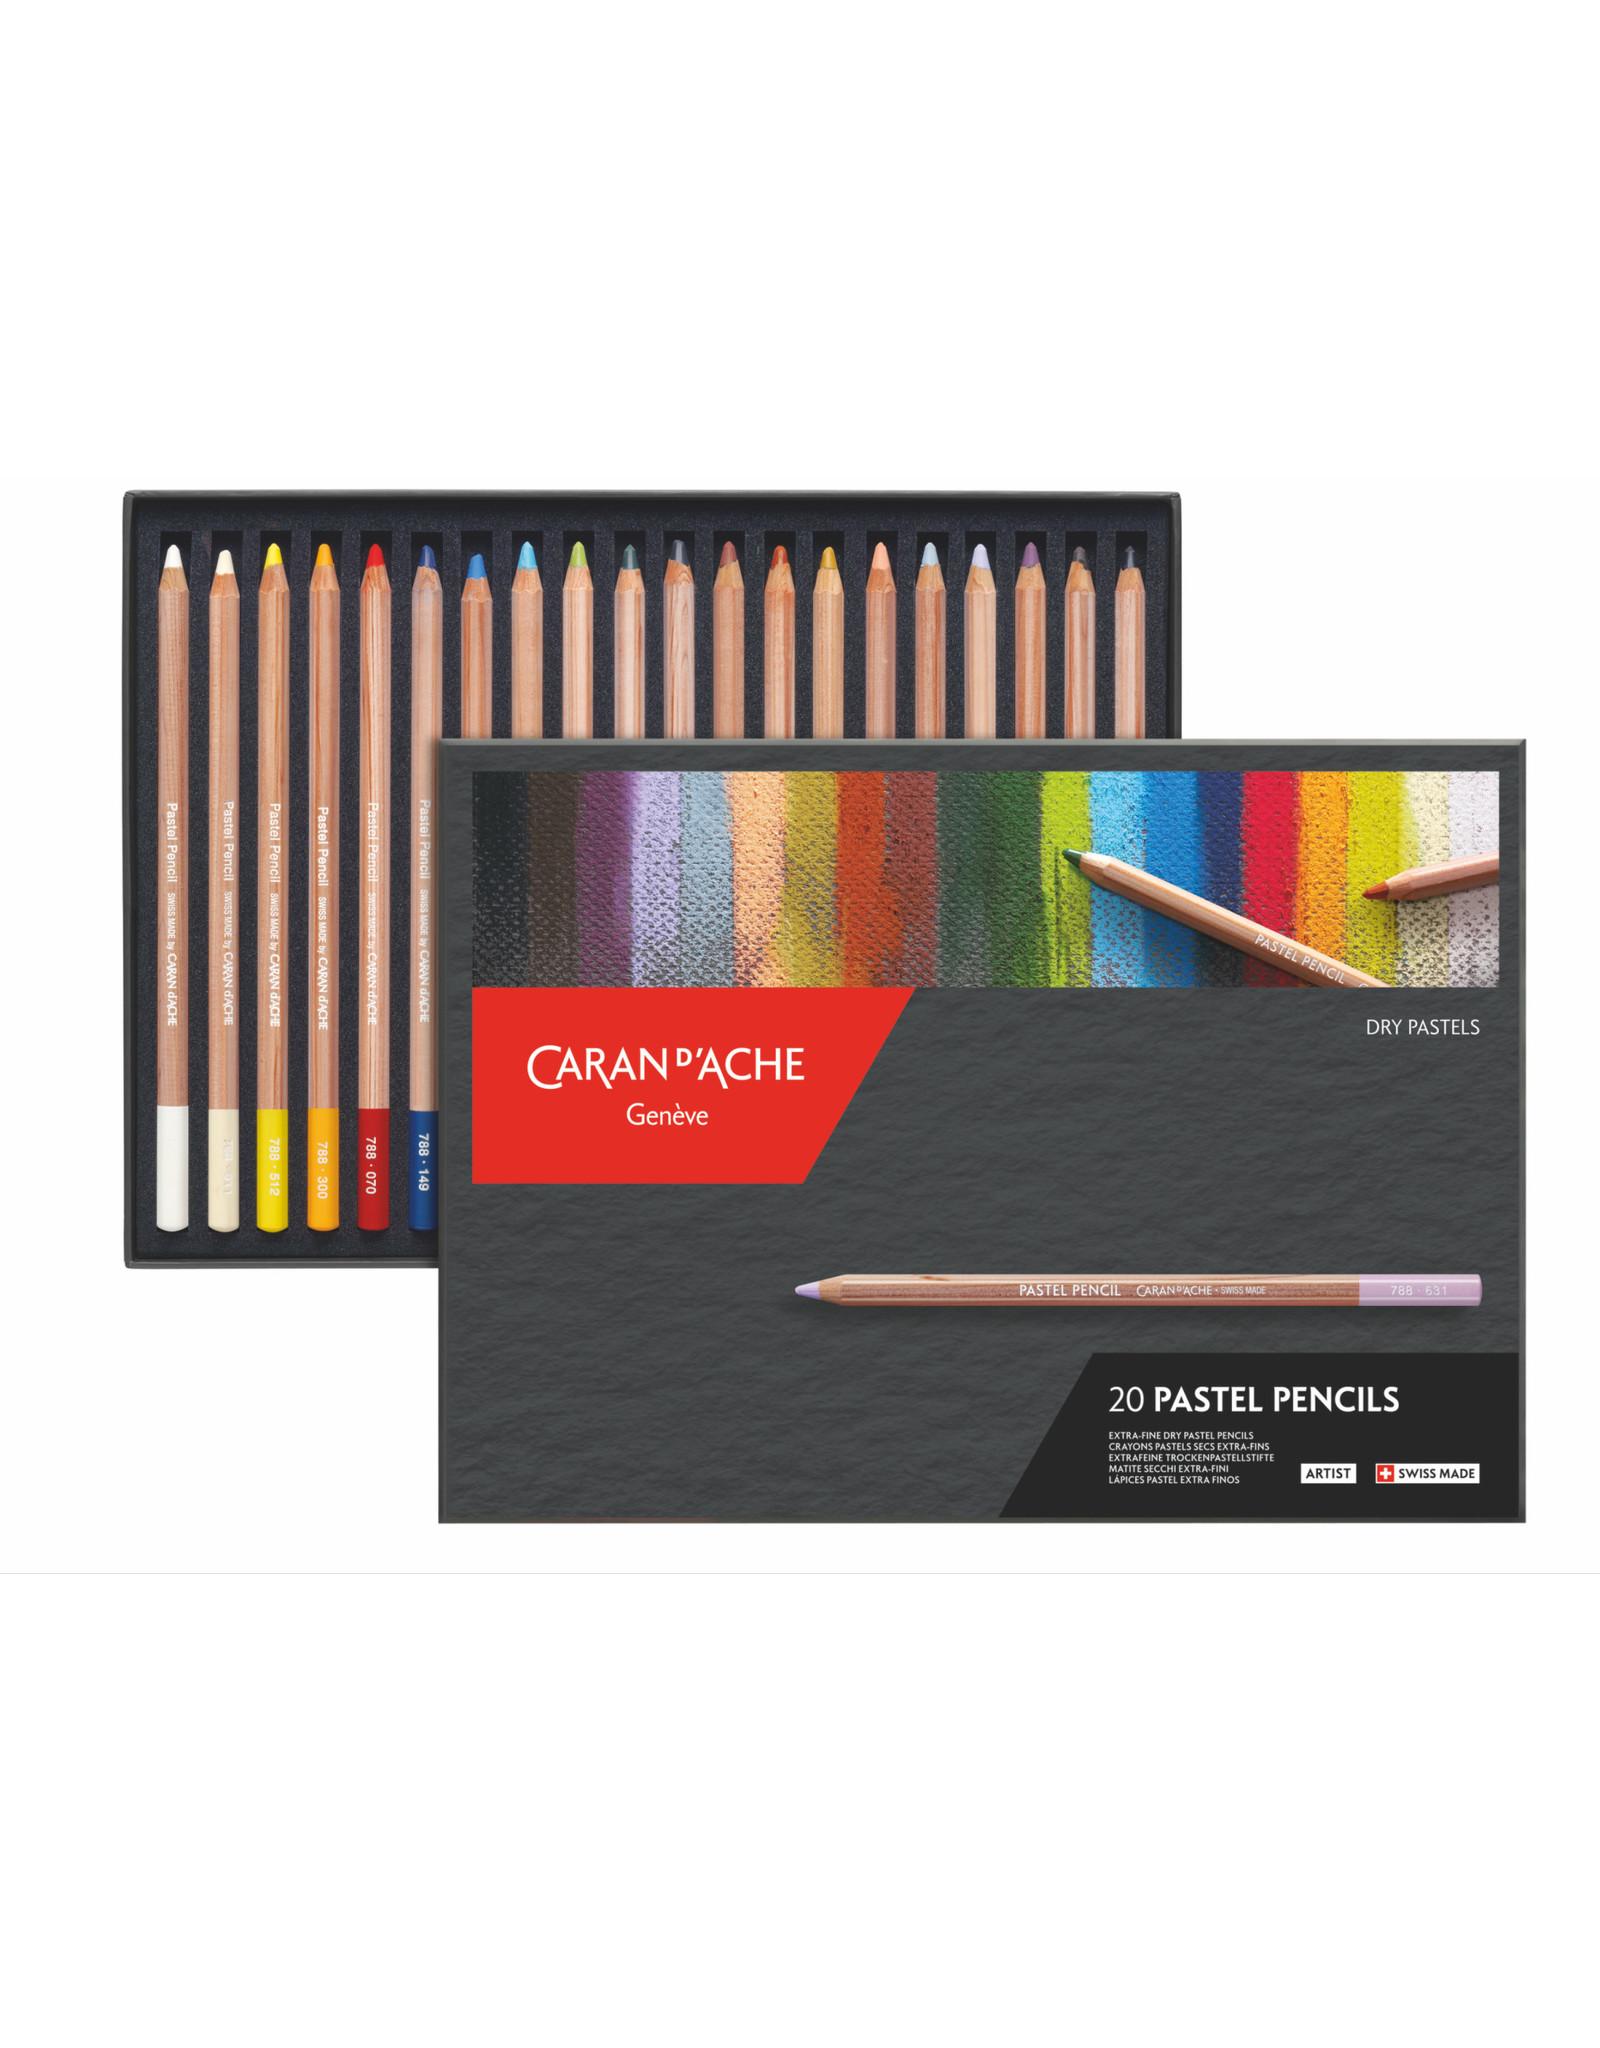 Caran d'Ache Pastel potloden set 20